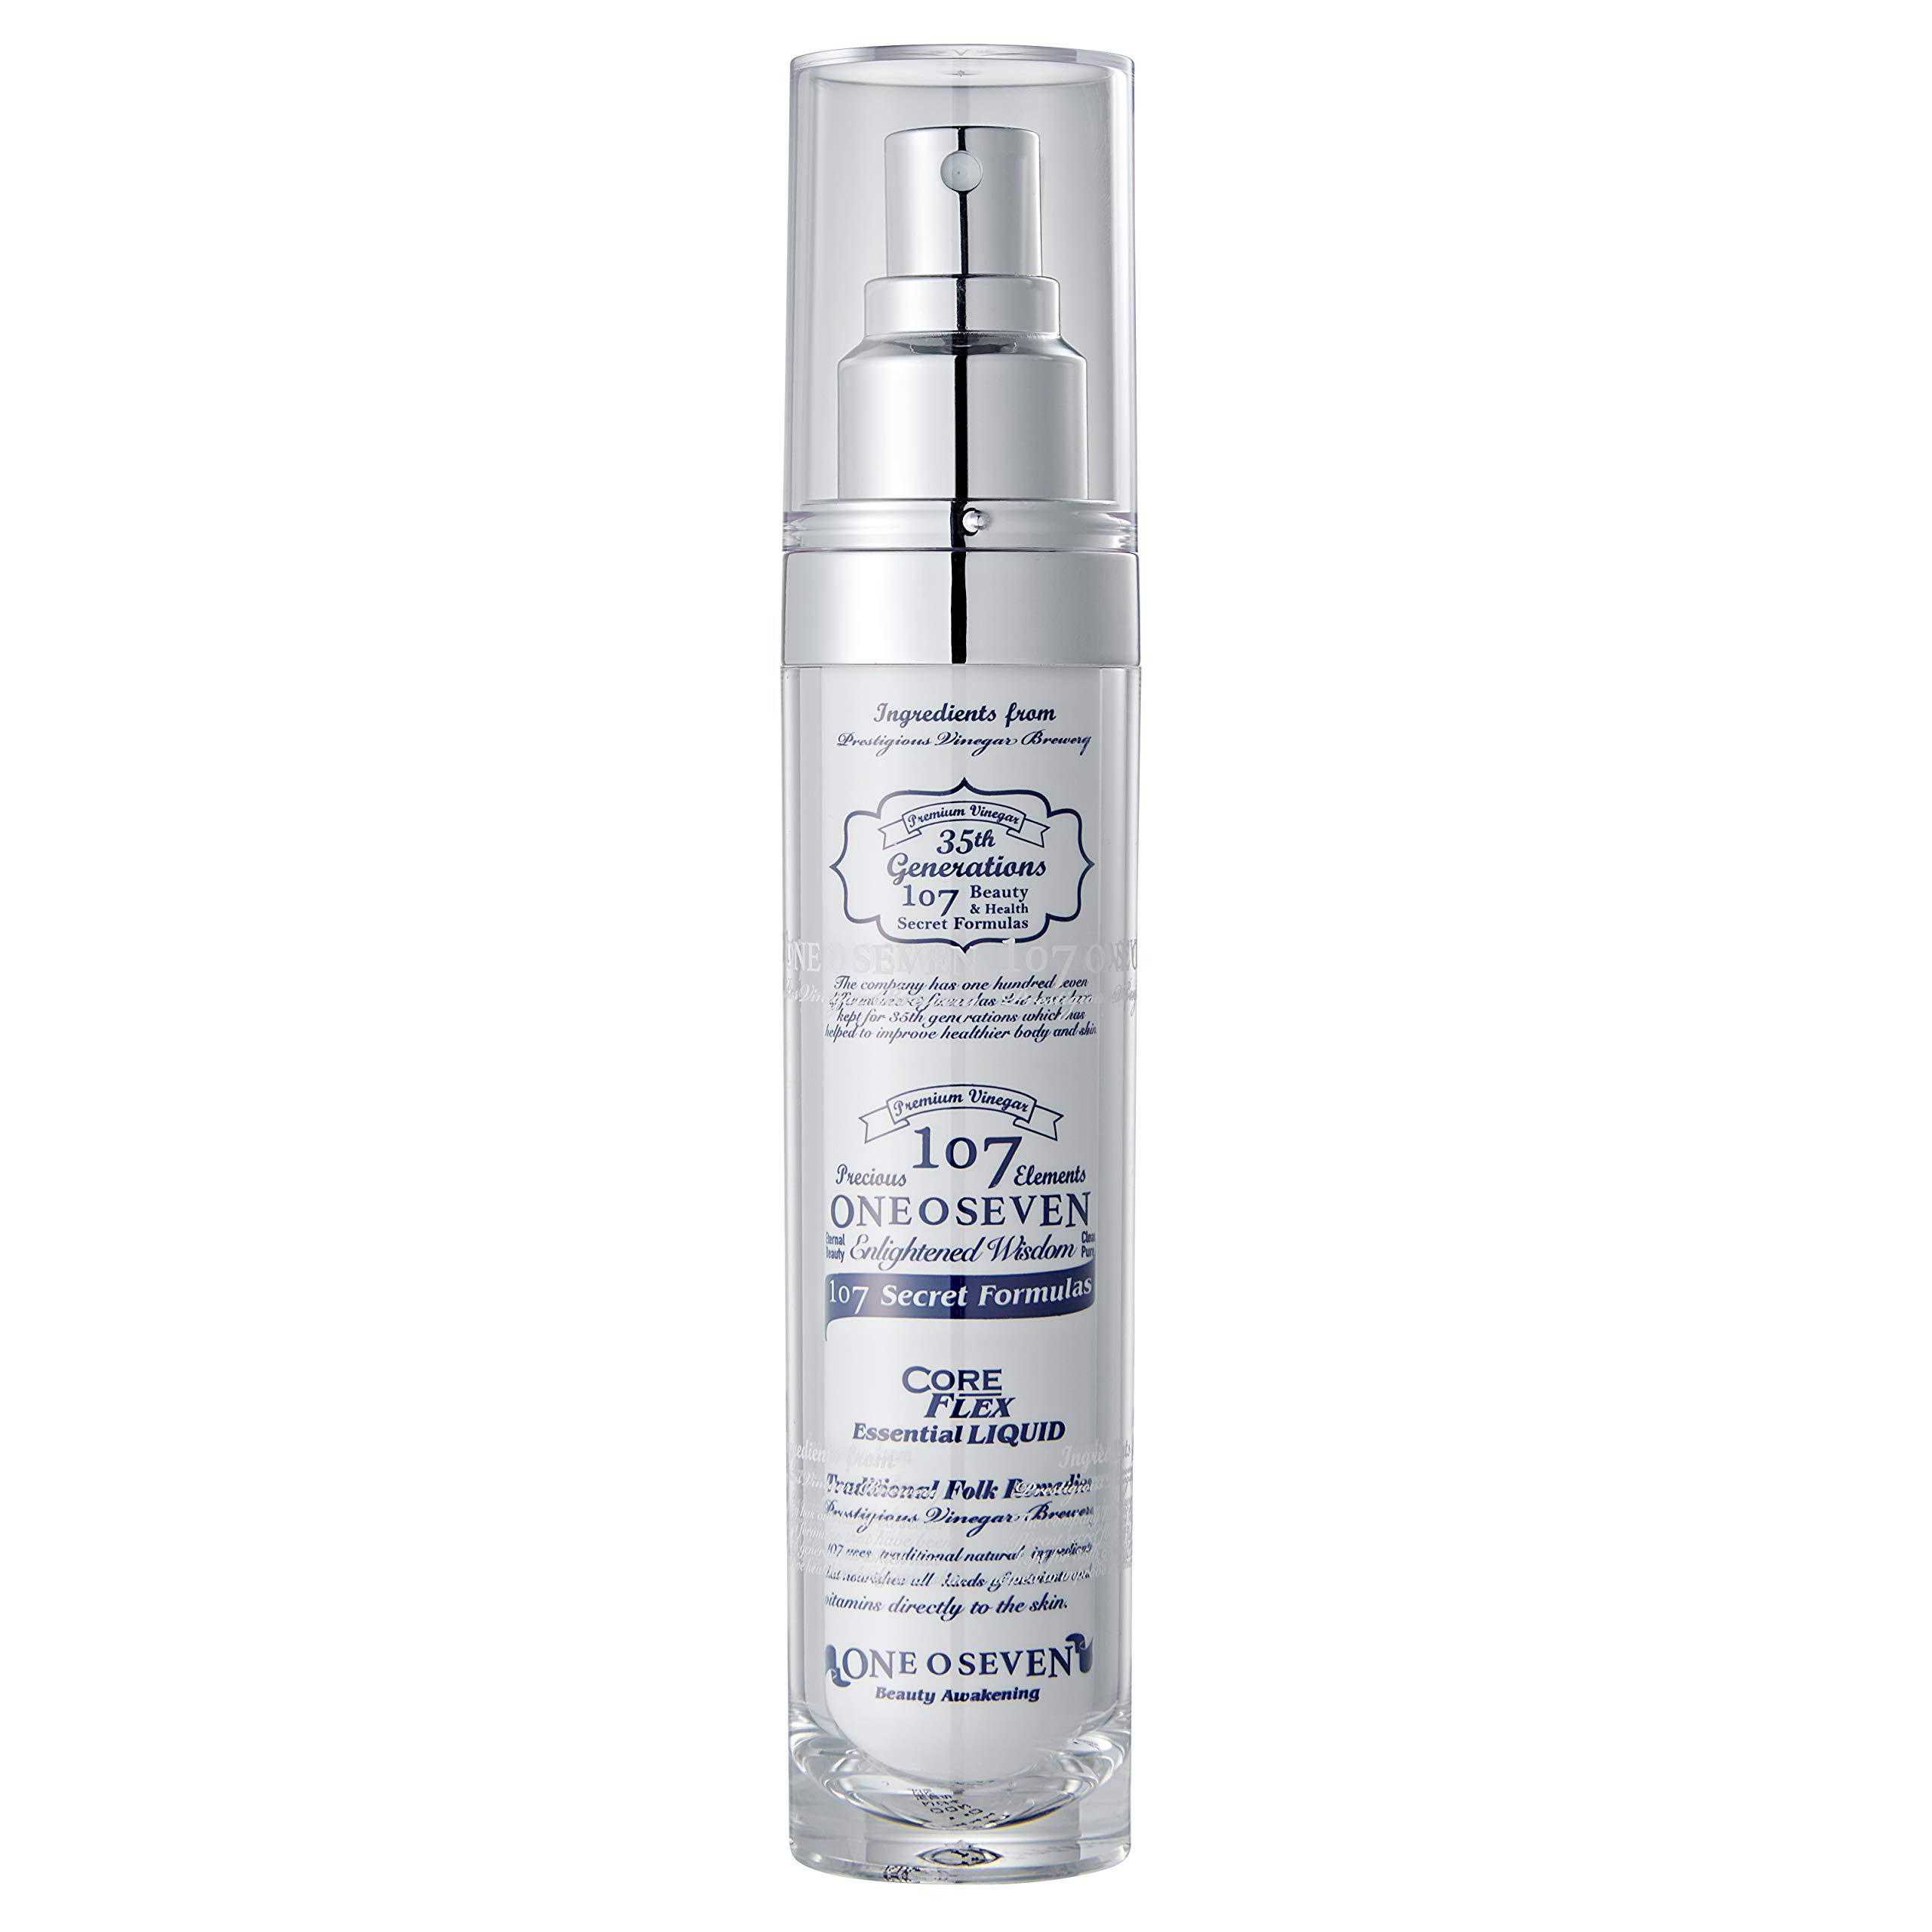 ONEOSEVEN Coreflex Essential Liquid Mist 50ml / 1.7 fl. oz. | Fermented Vinegar & Rice Ferment Filtrate | Glowing Skin, Low Irritation (50ml/1.7fl.oz.) by 107